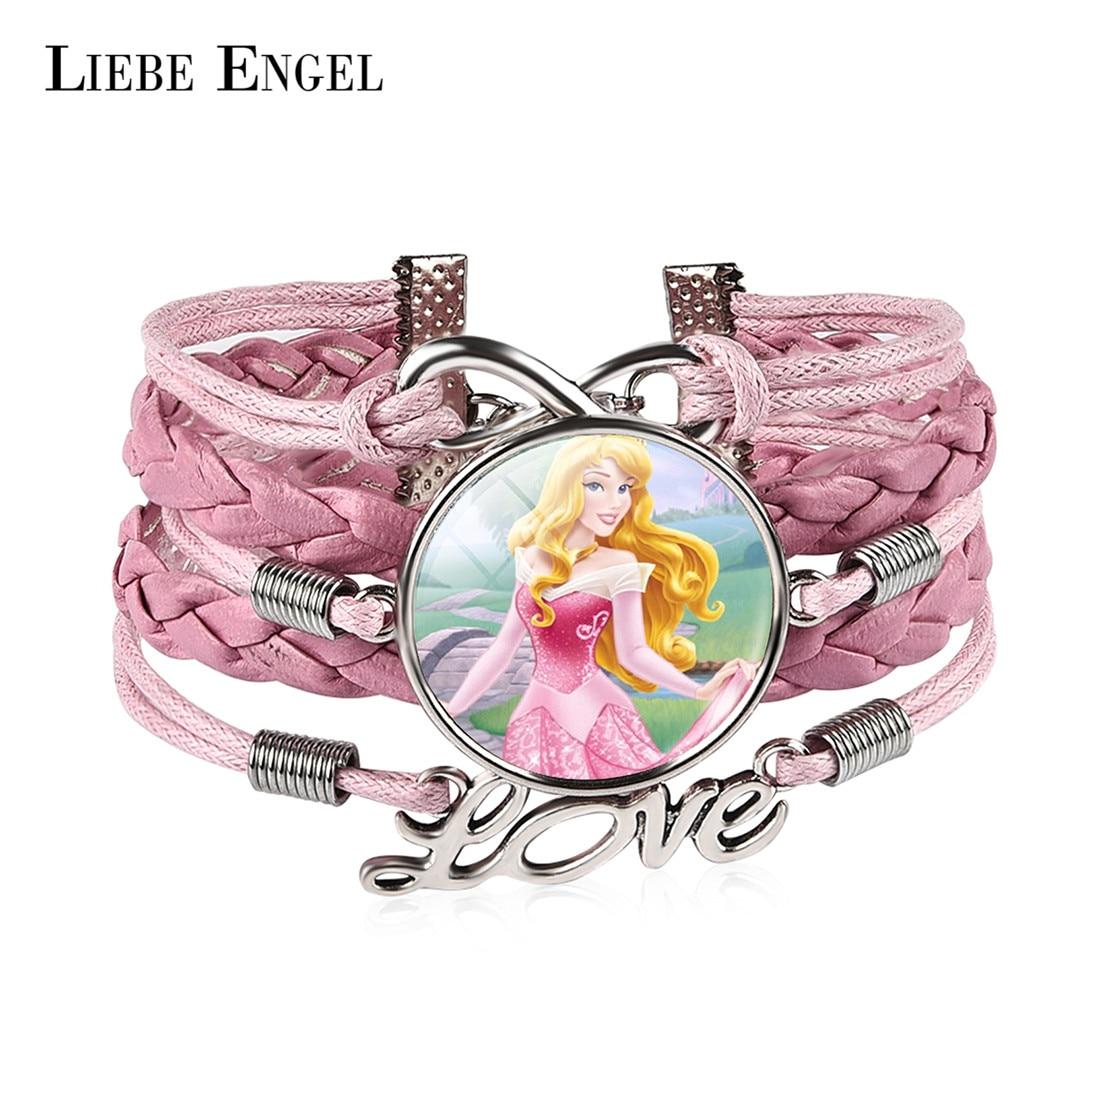 LIEBE ENGEL Fashion Anime Sleeping Beauty Glass Infinity Love Pink Leather Bracelet For Girls Women Accessories Jewelry Gift